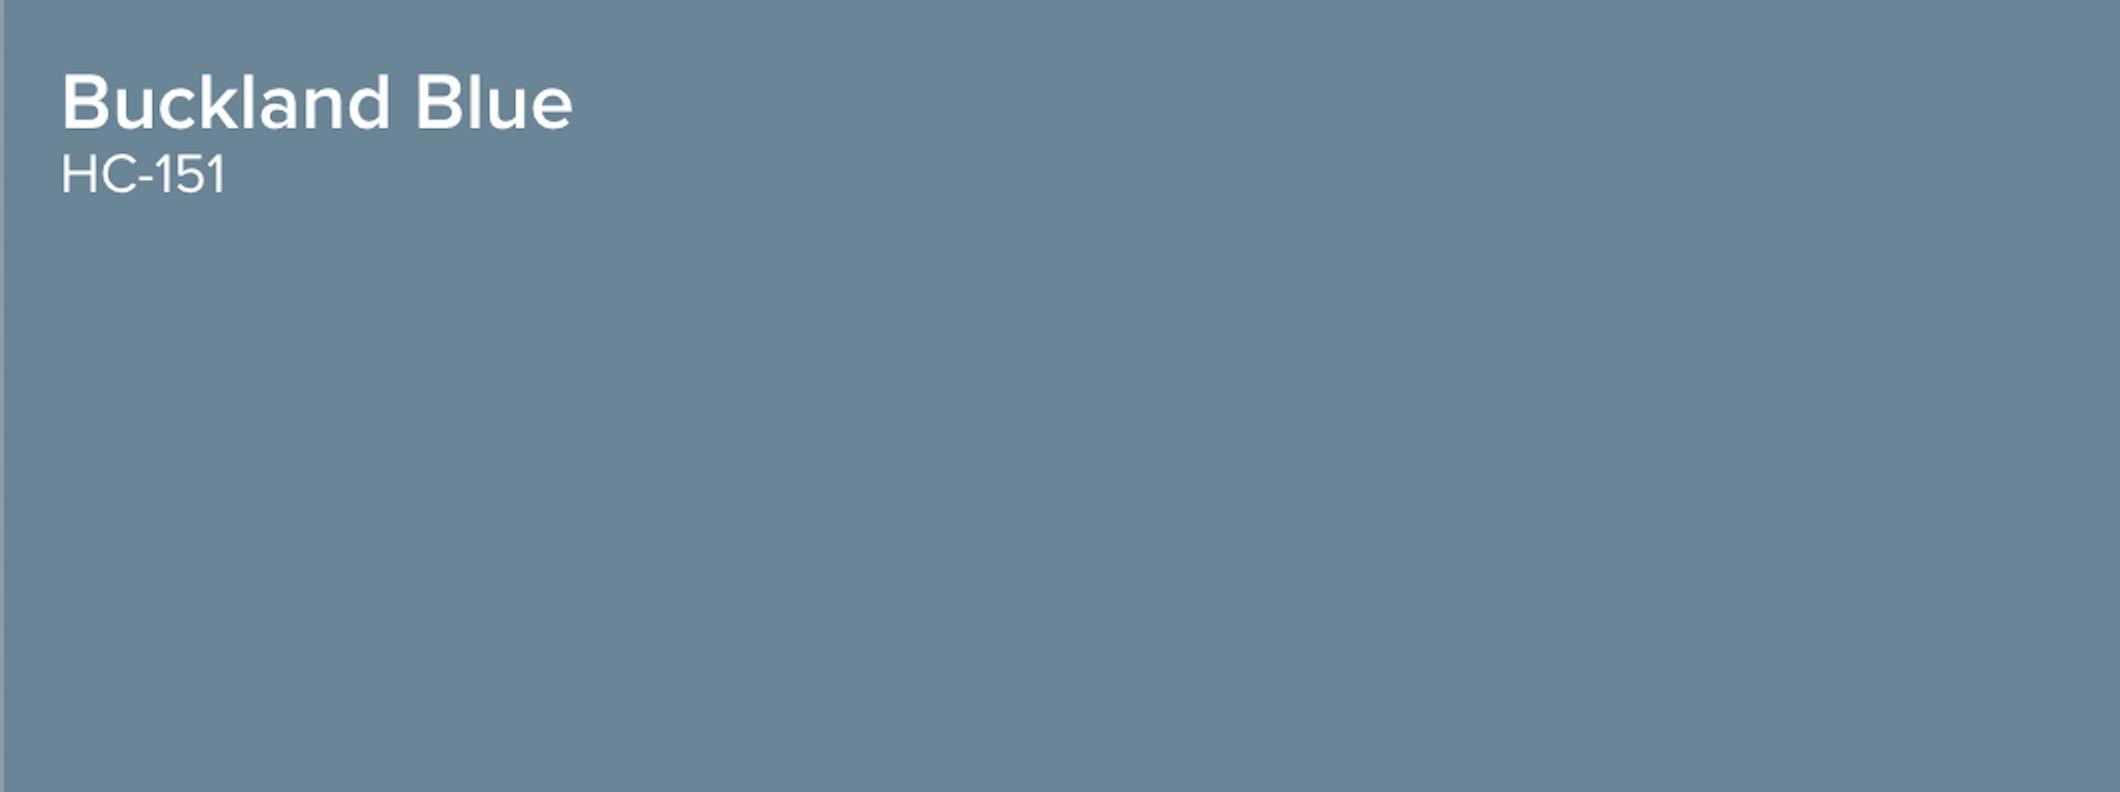 Buckland Blue sample